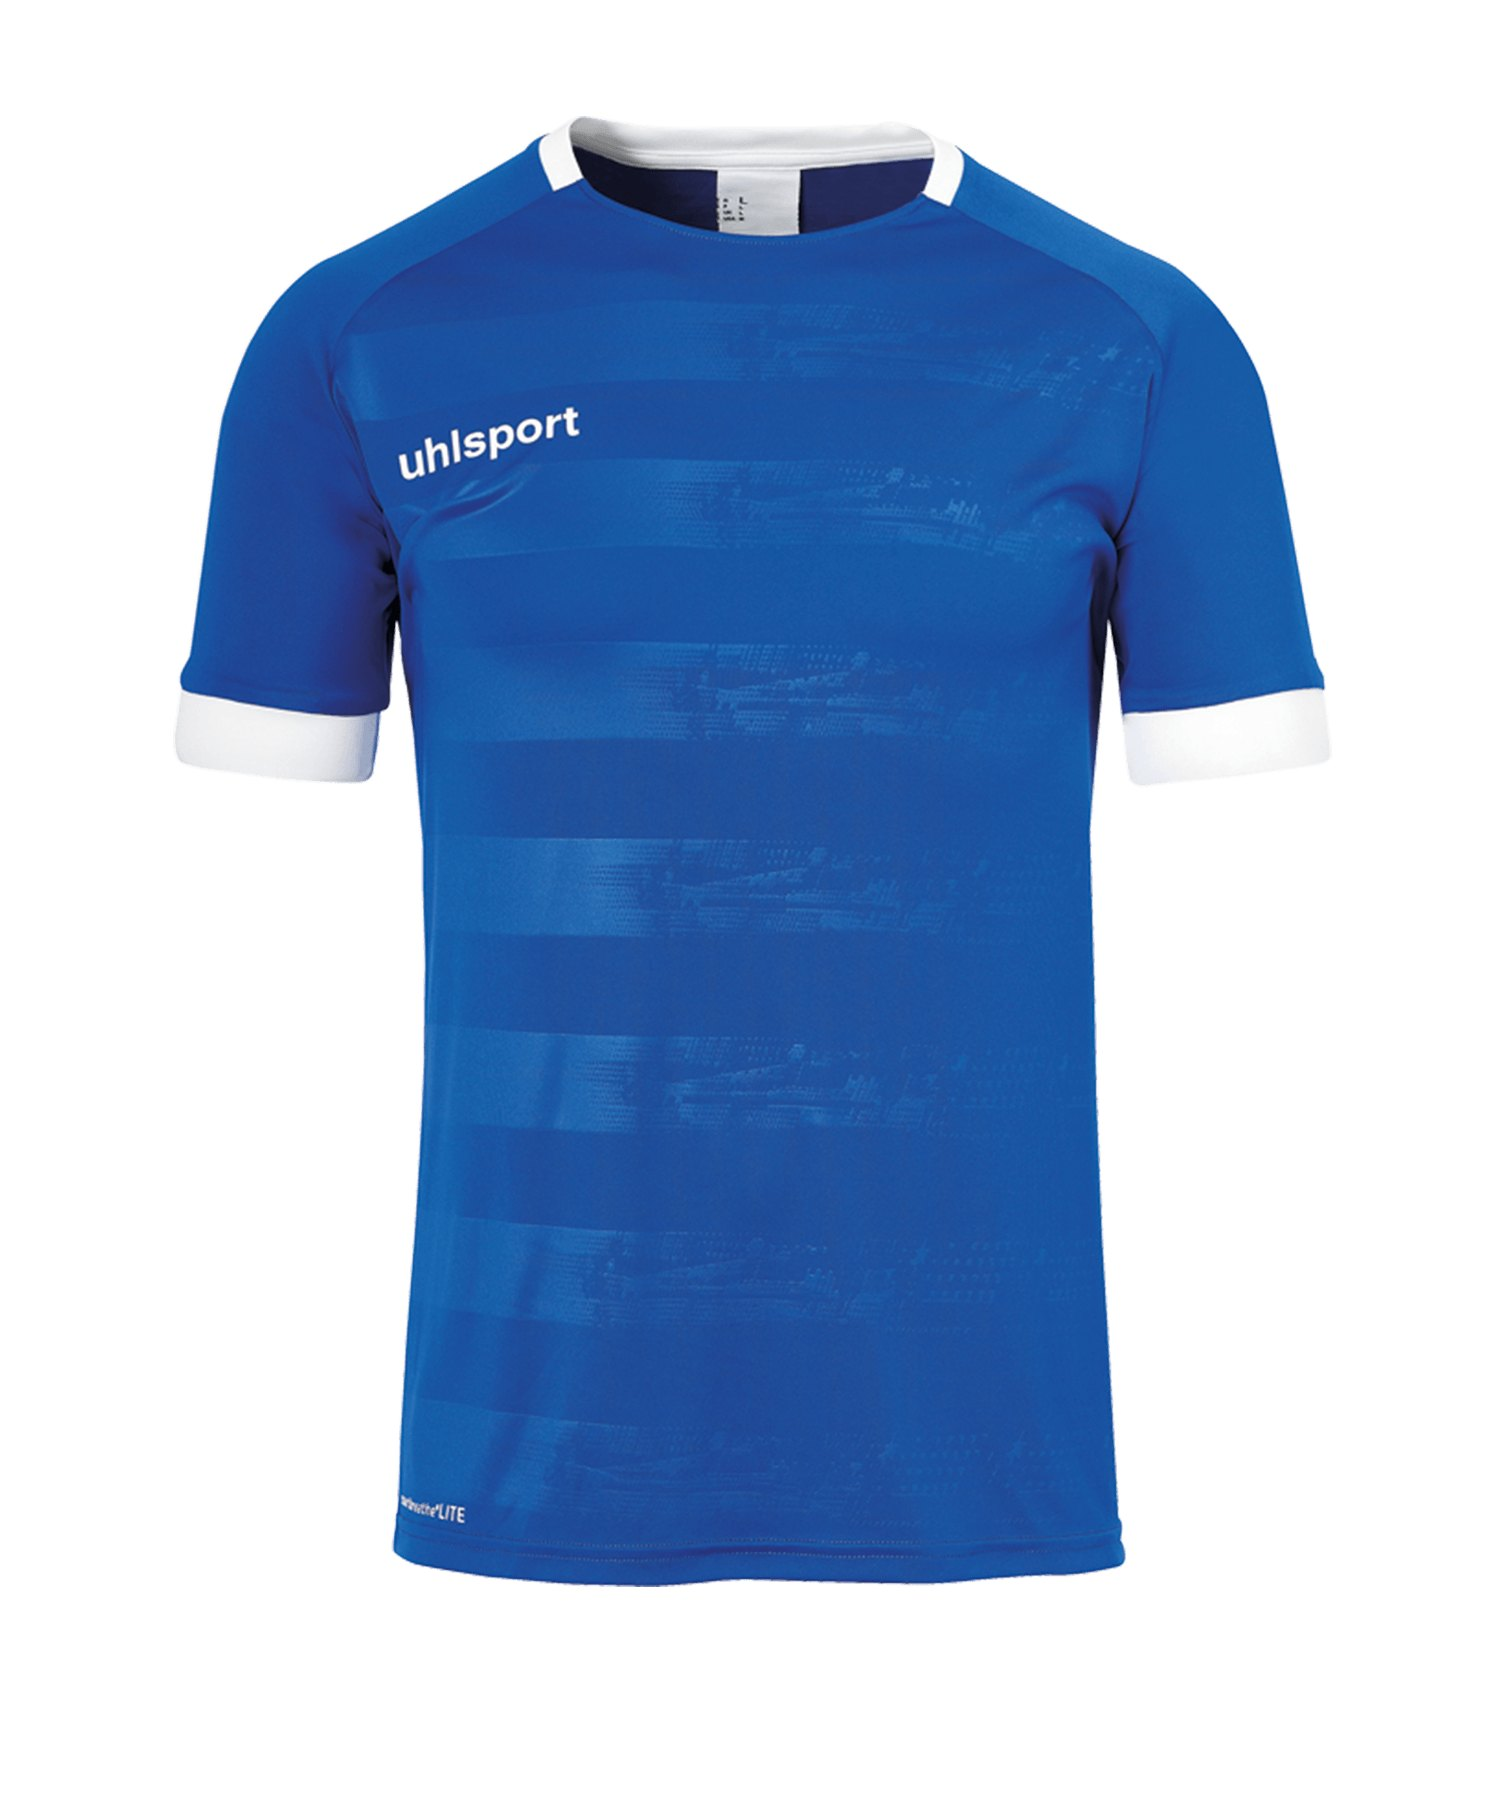 Uhlsport Division II Trikot kurzarm Blau Weiss F03 - blau